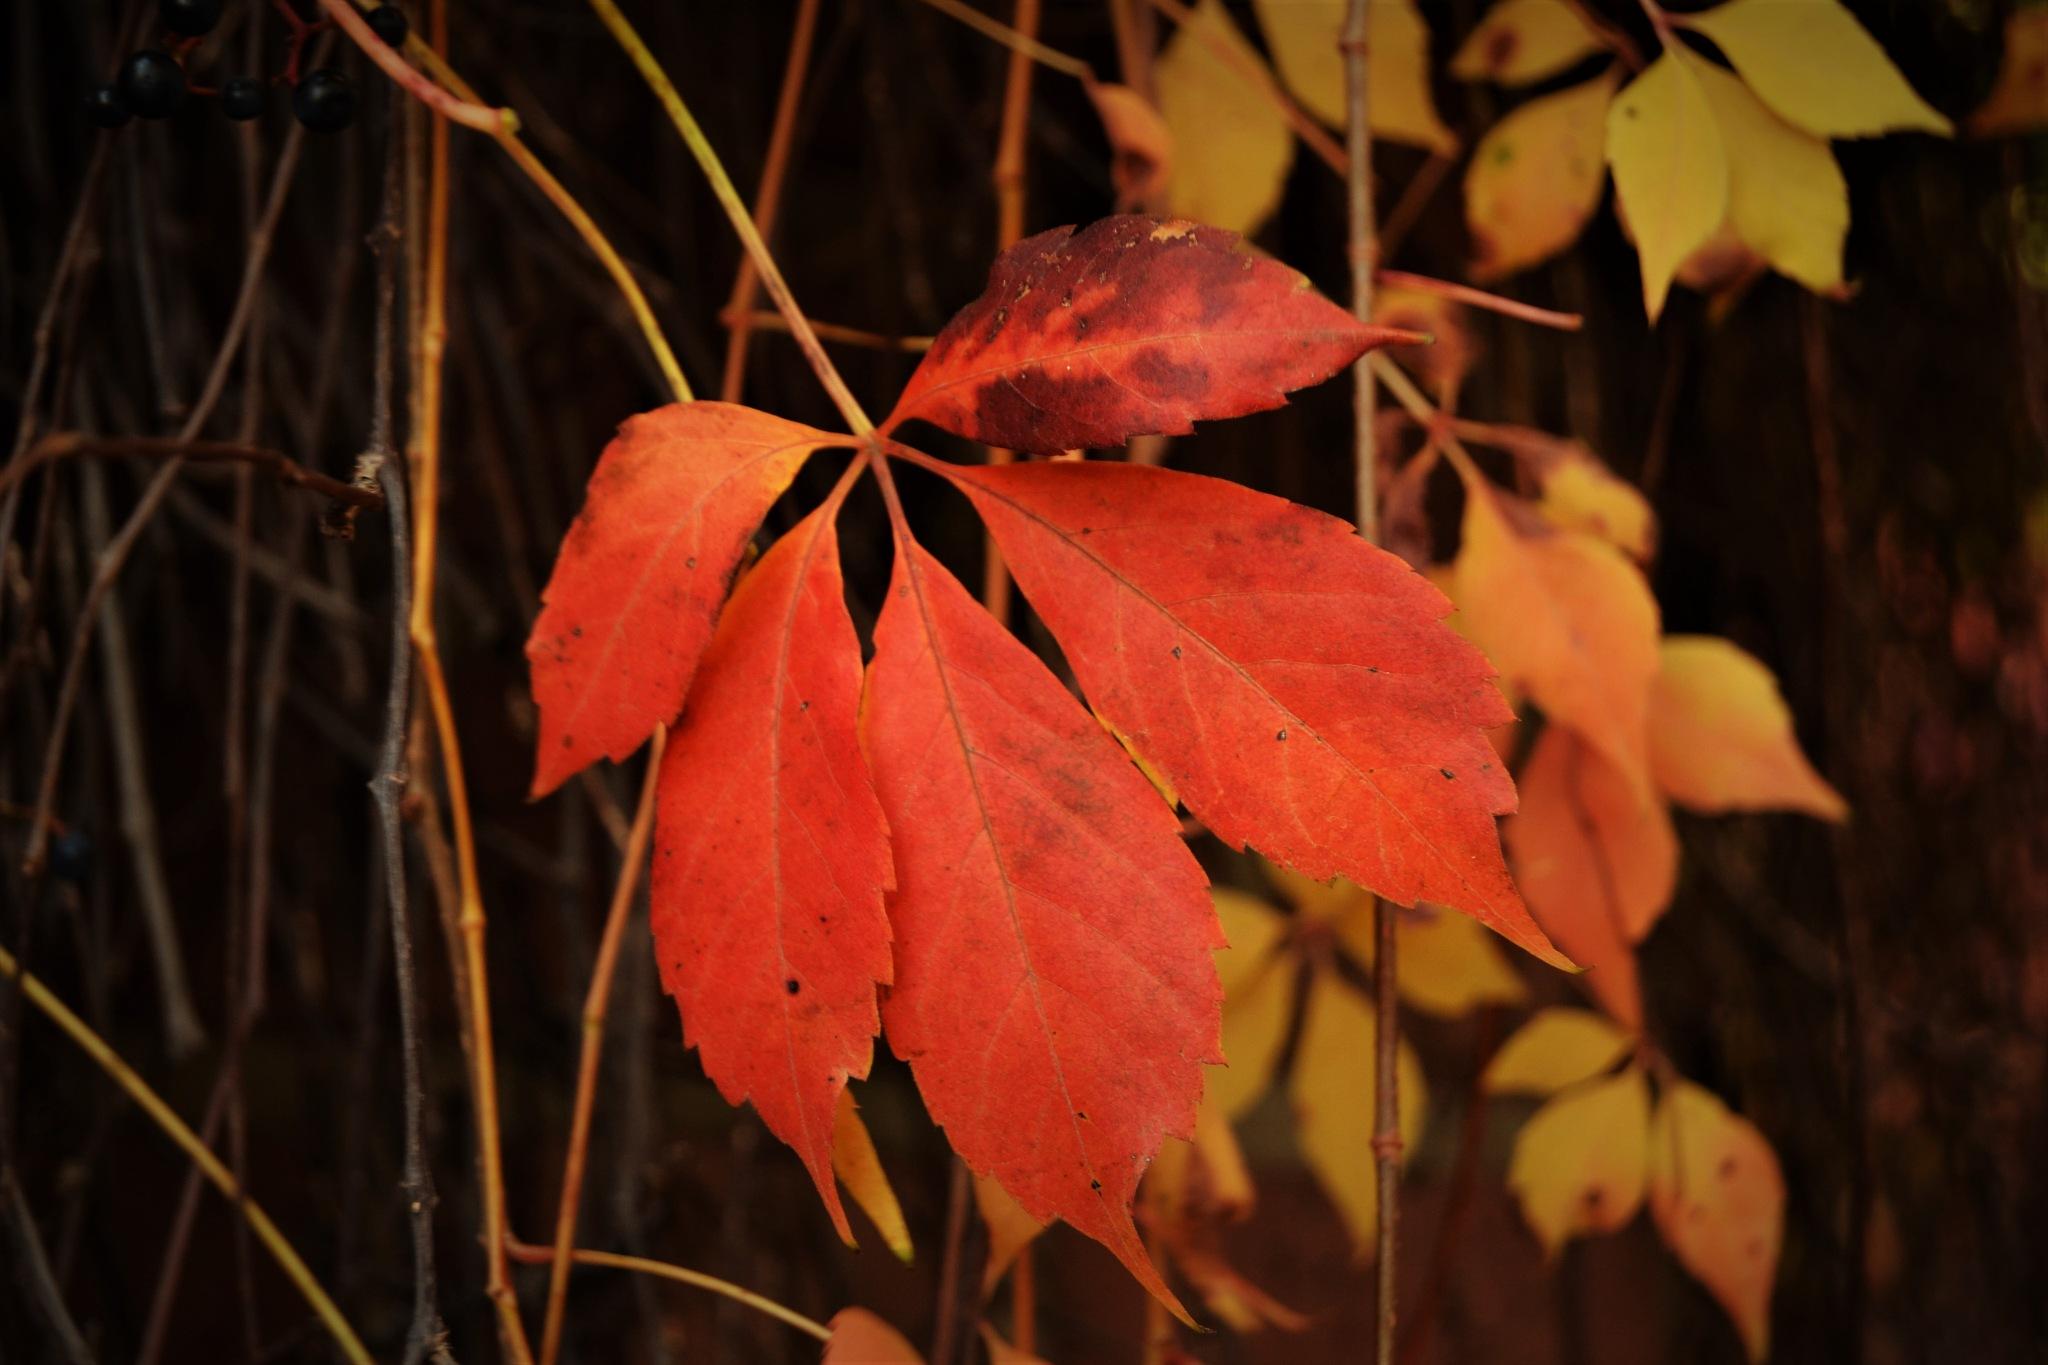 Autumn by Laura Lehmann